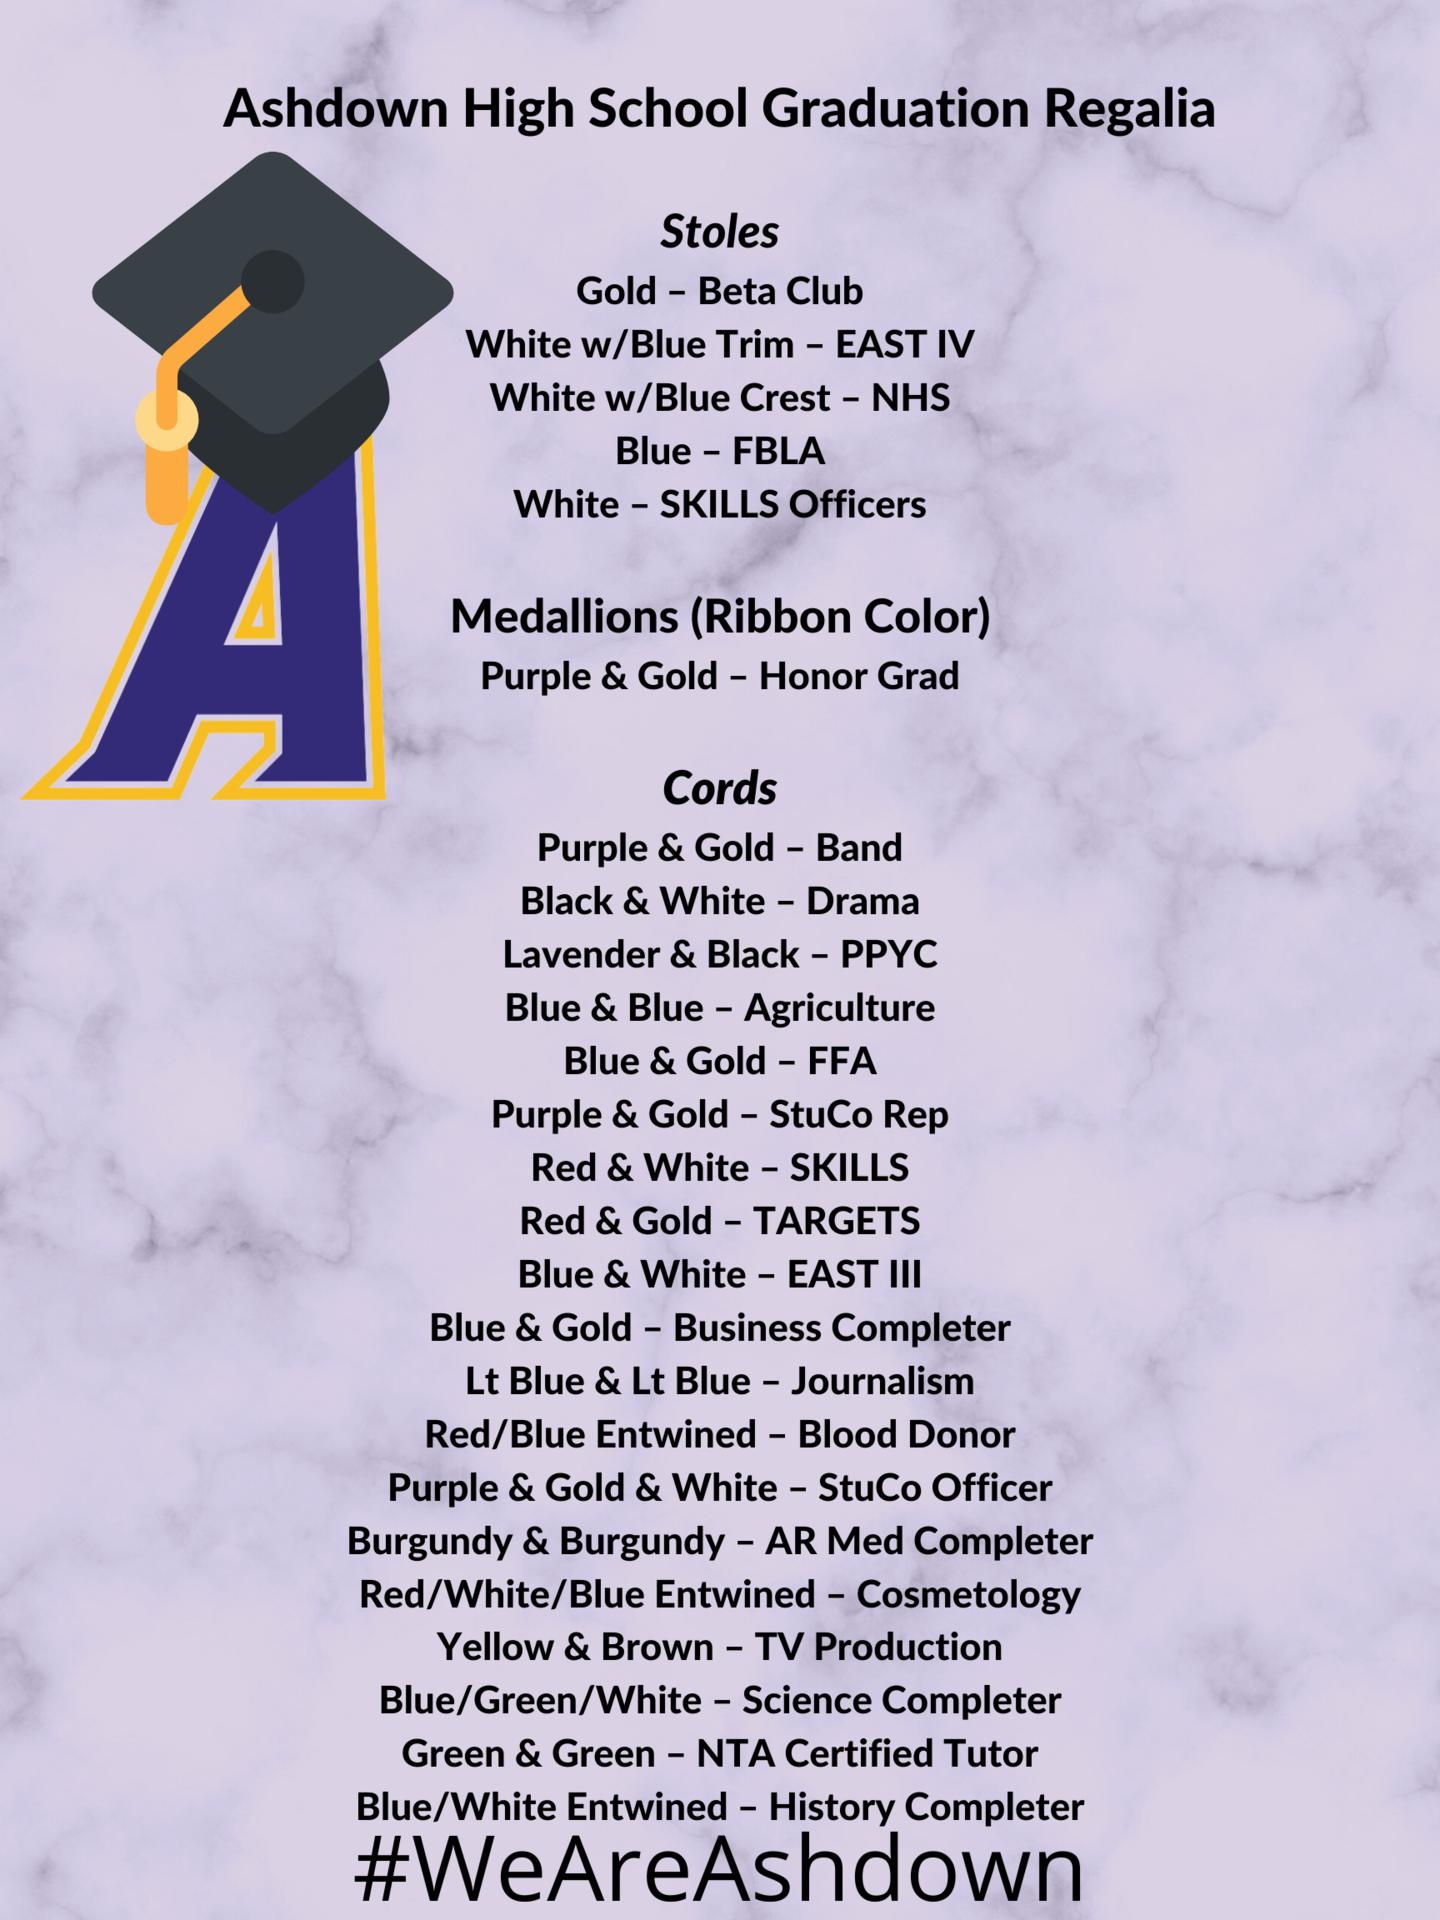 Graduation Regalia Chart